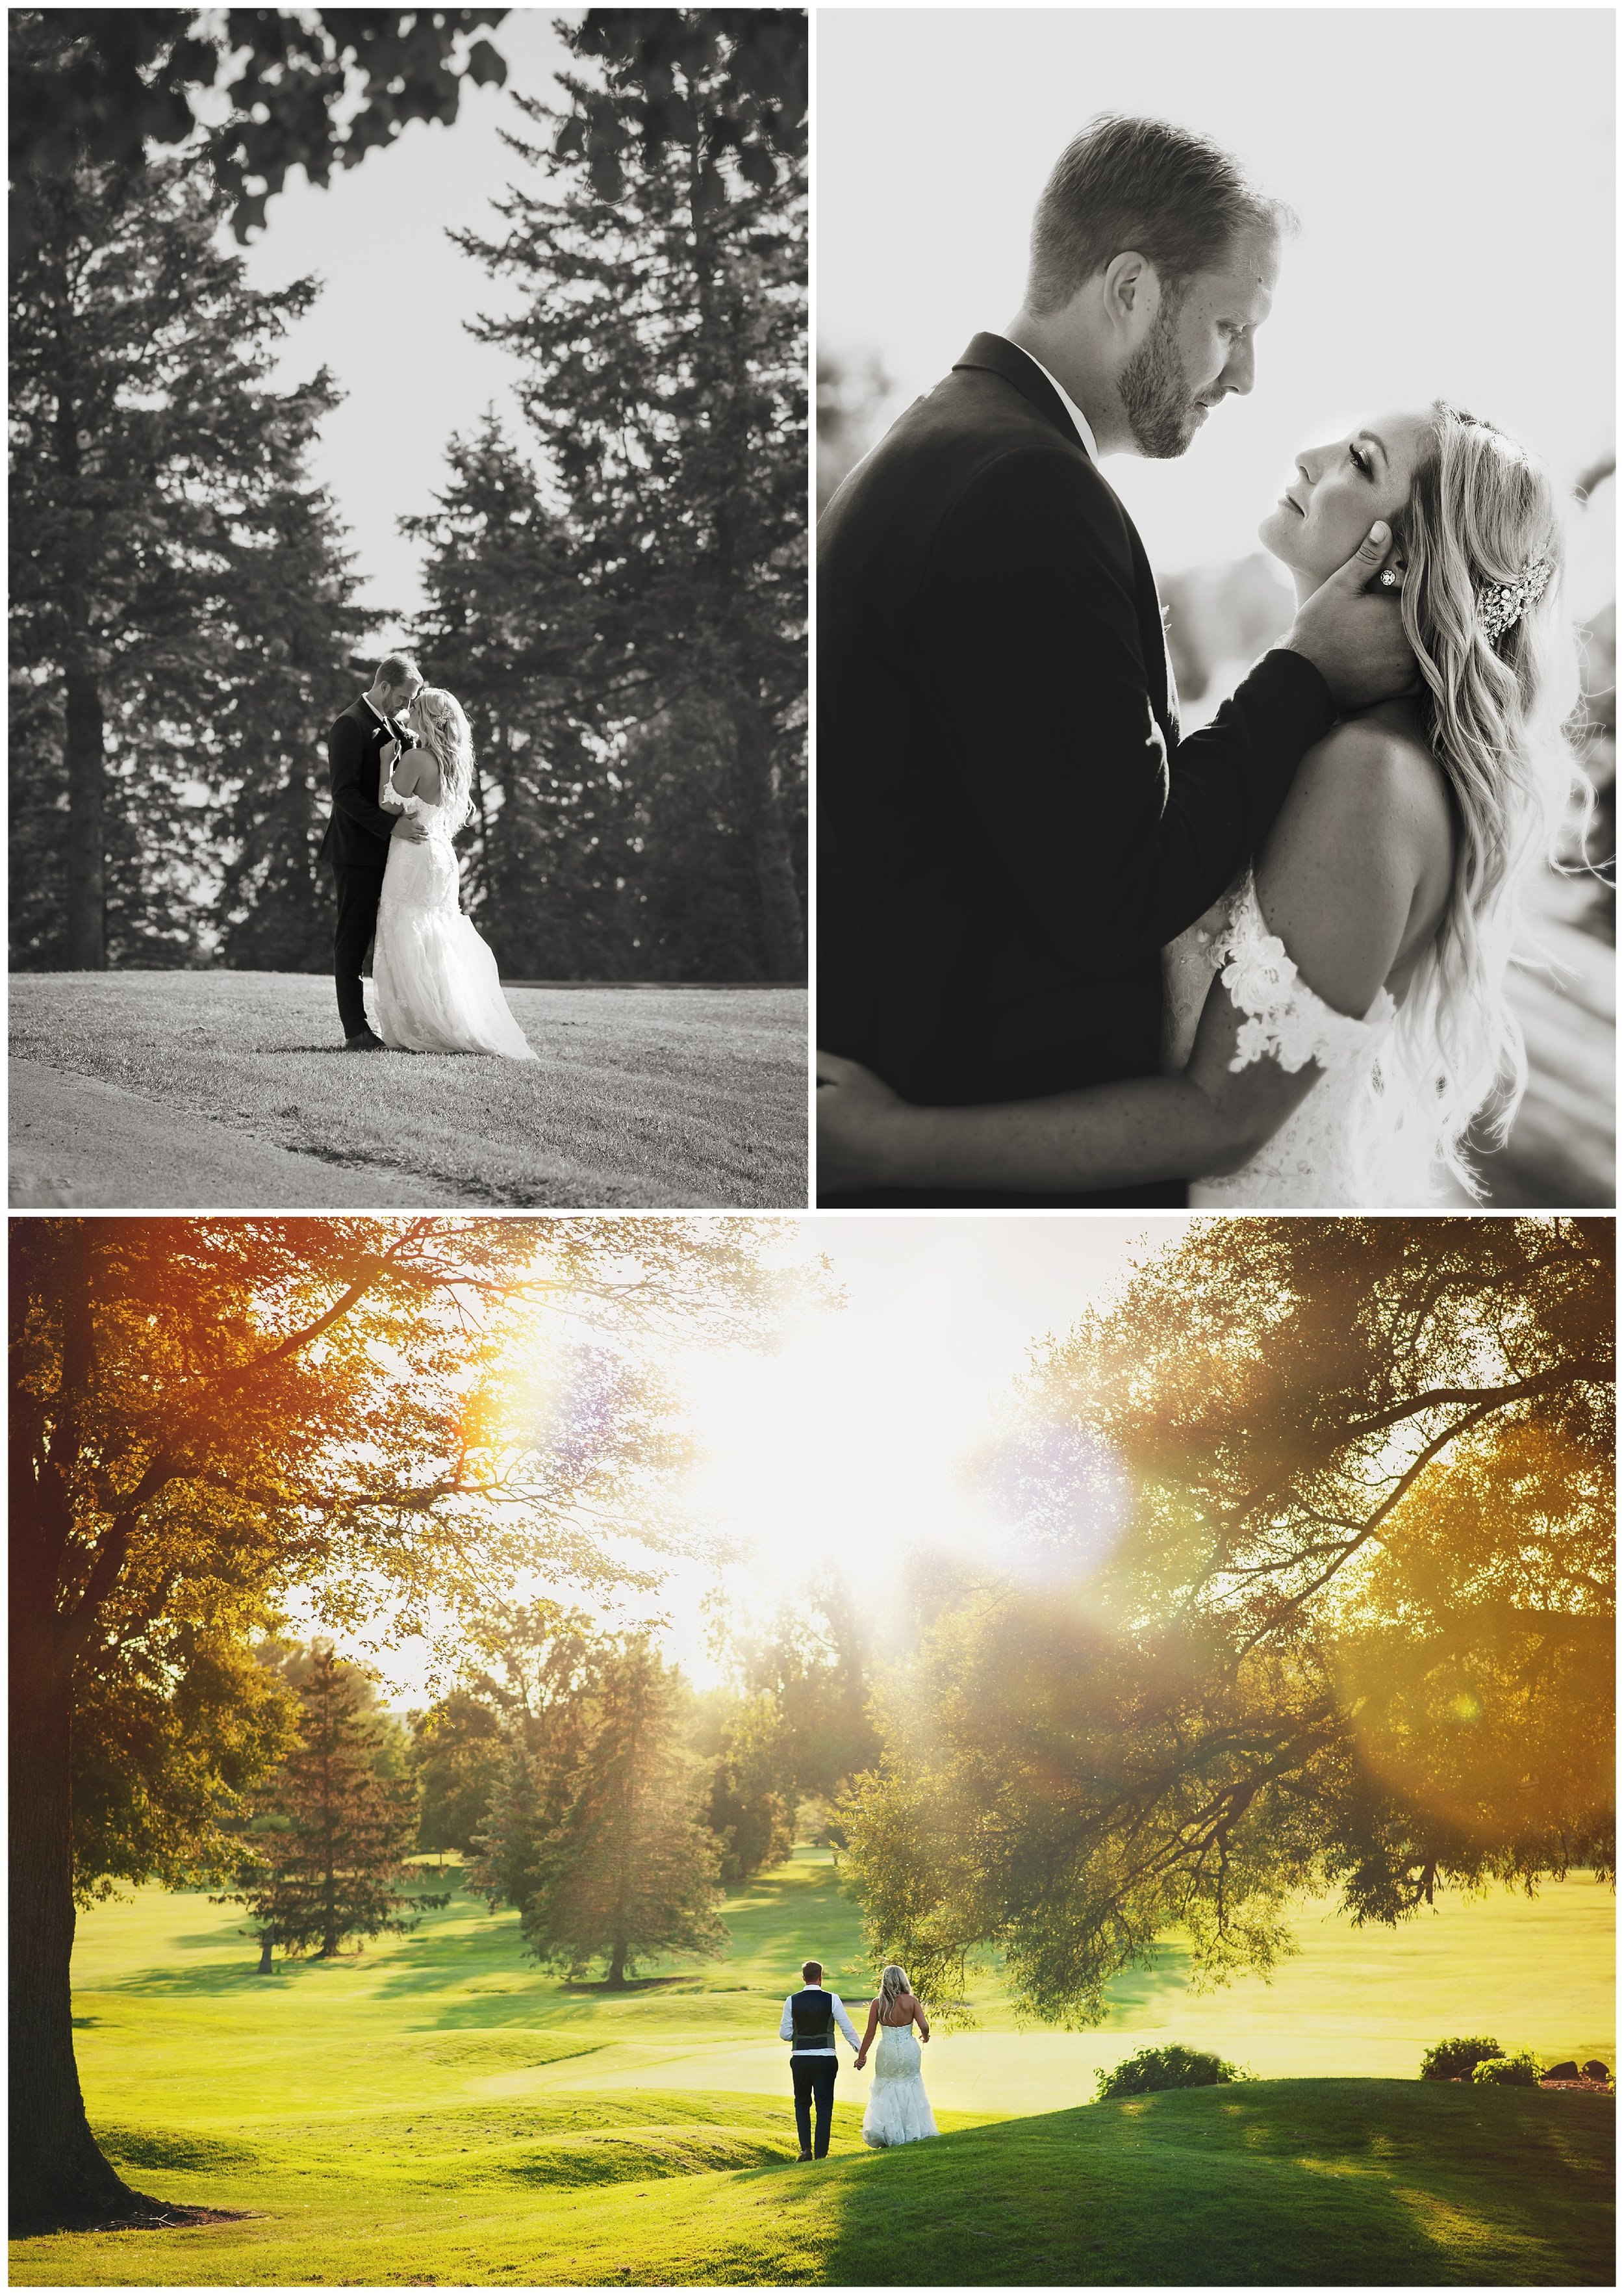 VanDaele-Russell-Wedding-Photography-London-Toronto-Ontario_0177.jpg